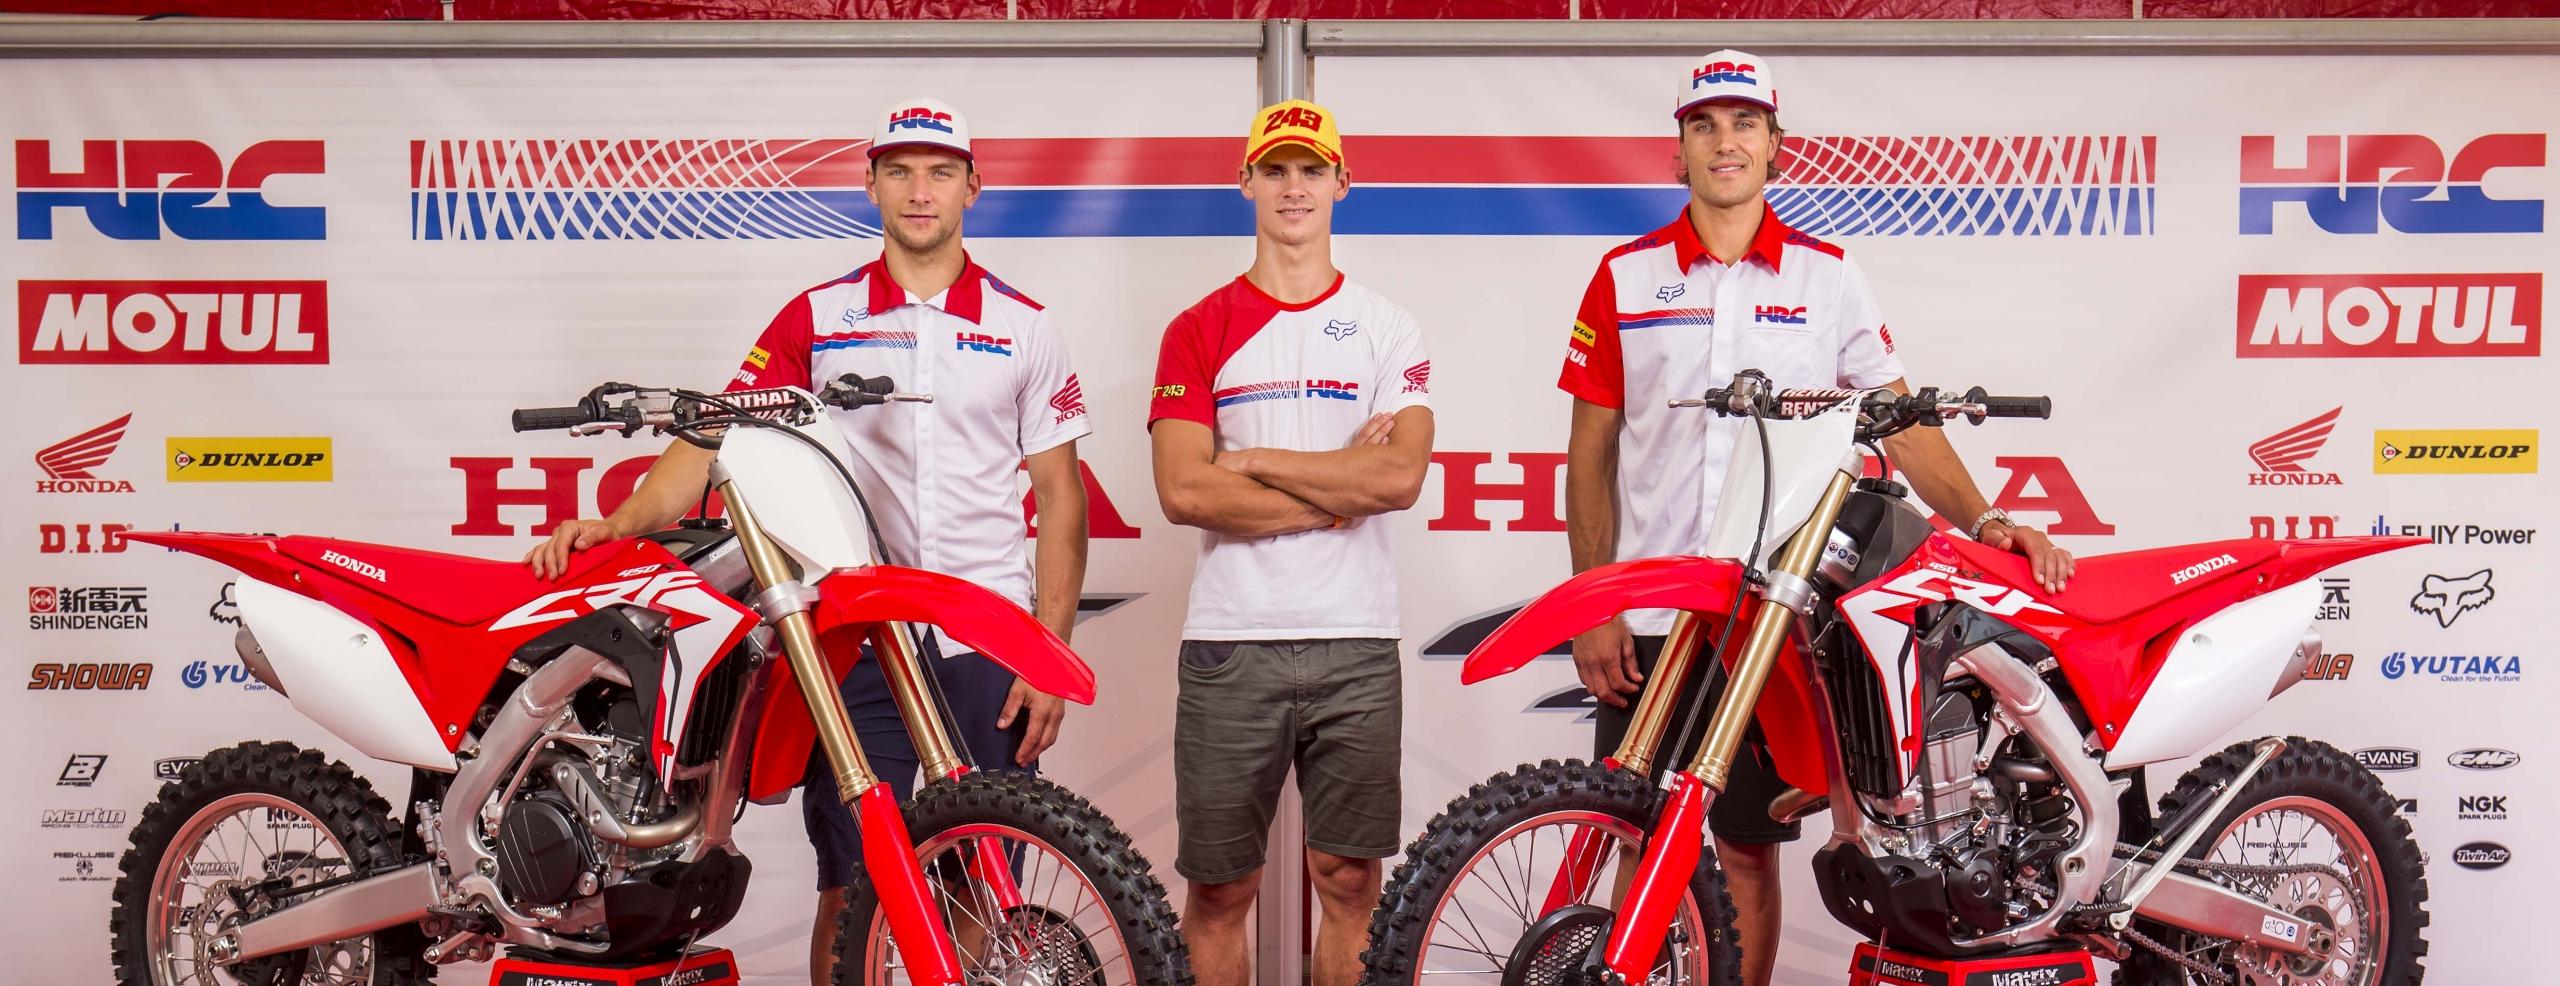 Honda's factory teams unveil 2017 Honda CRFs at MXGP of The Netherlands